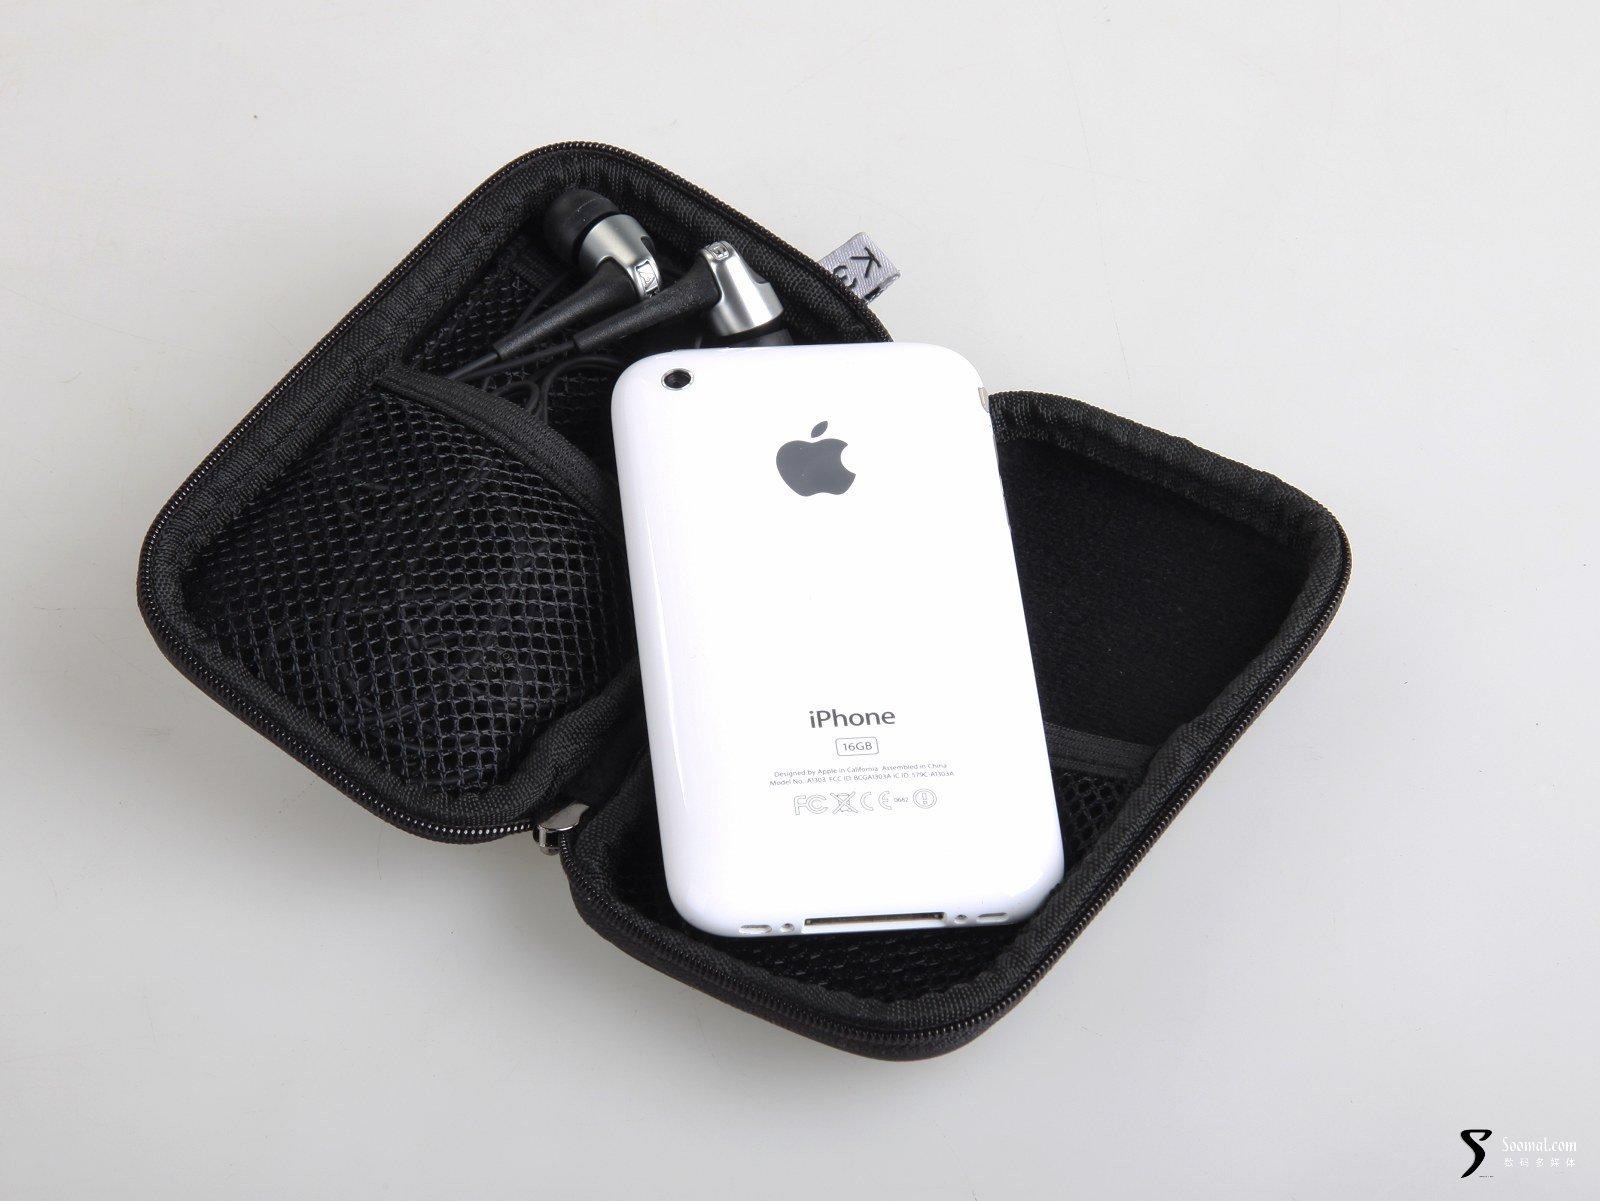 akg k370 入耳式耳机收纳包与iphone图片